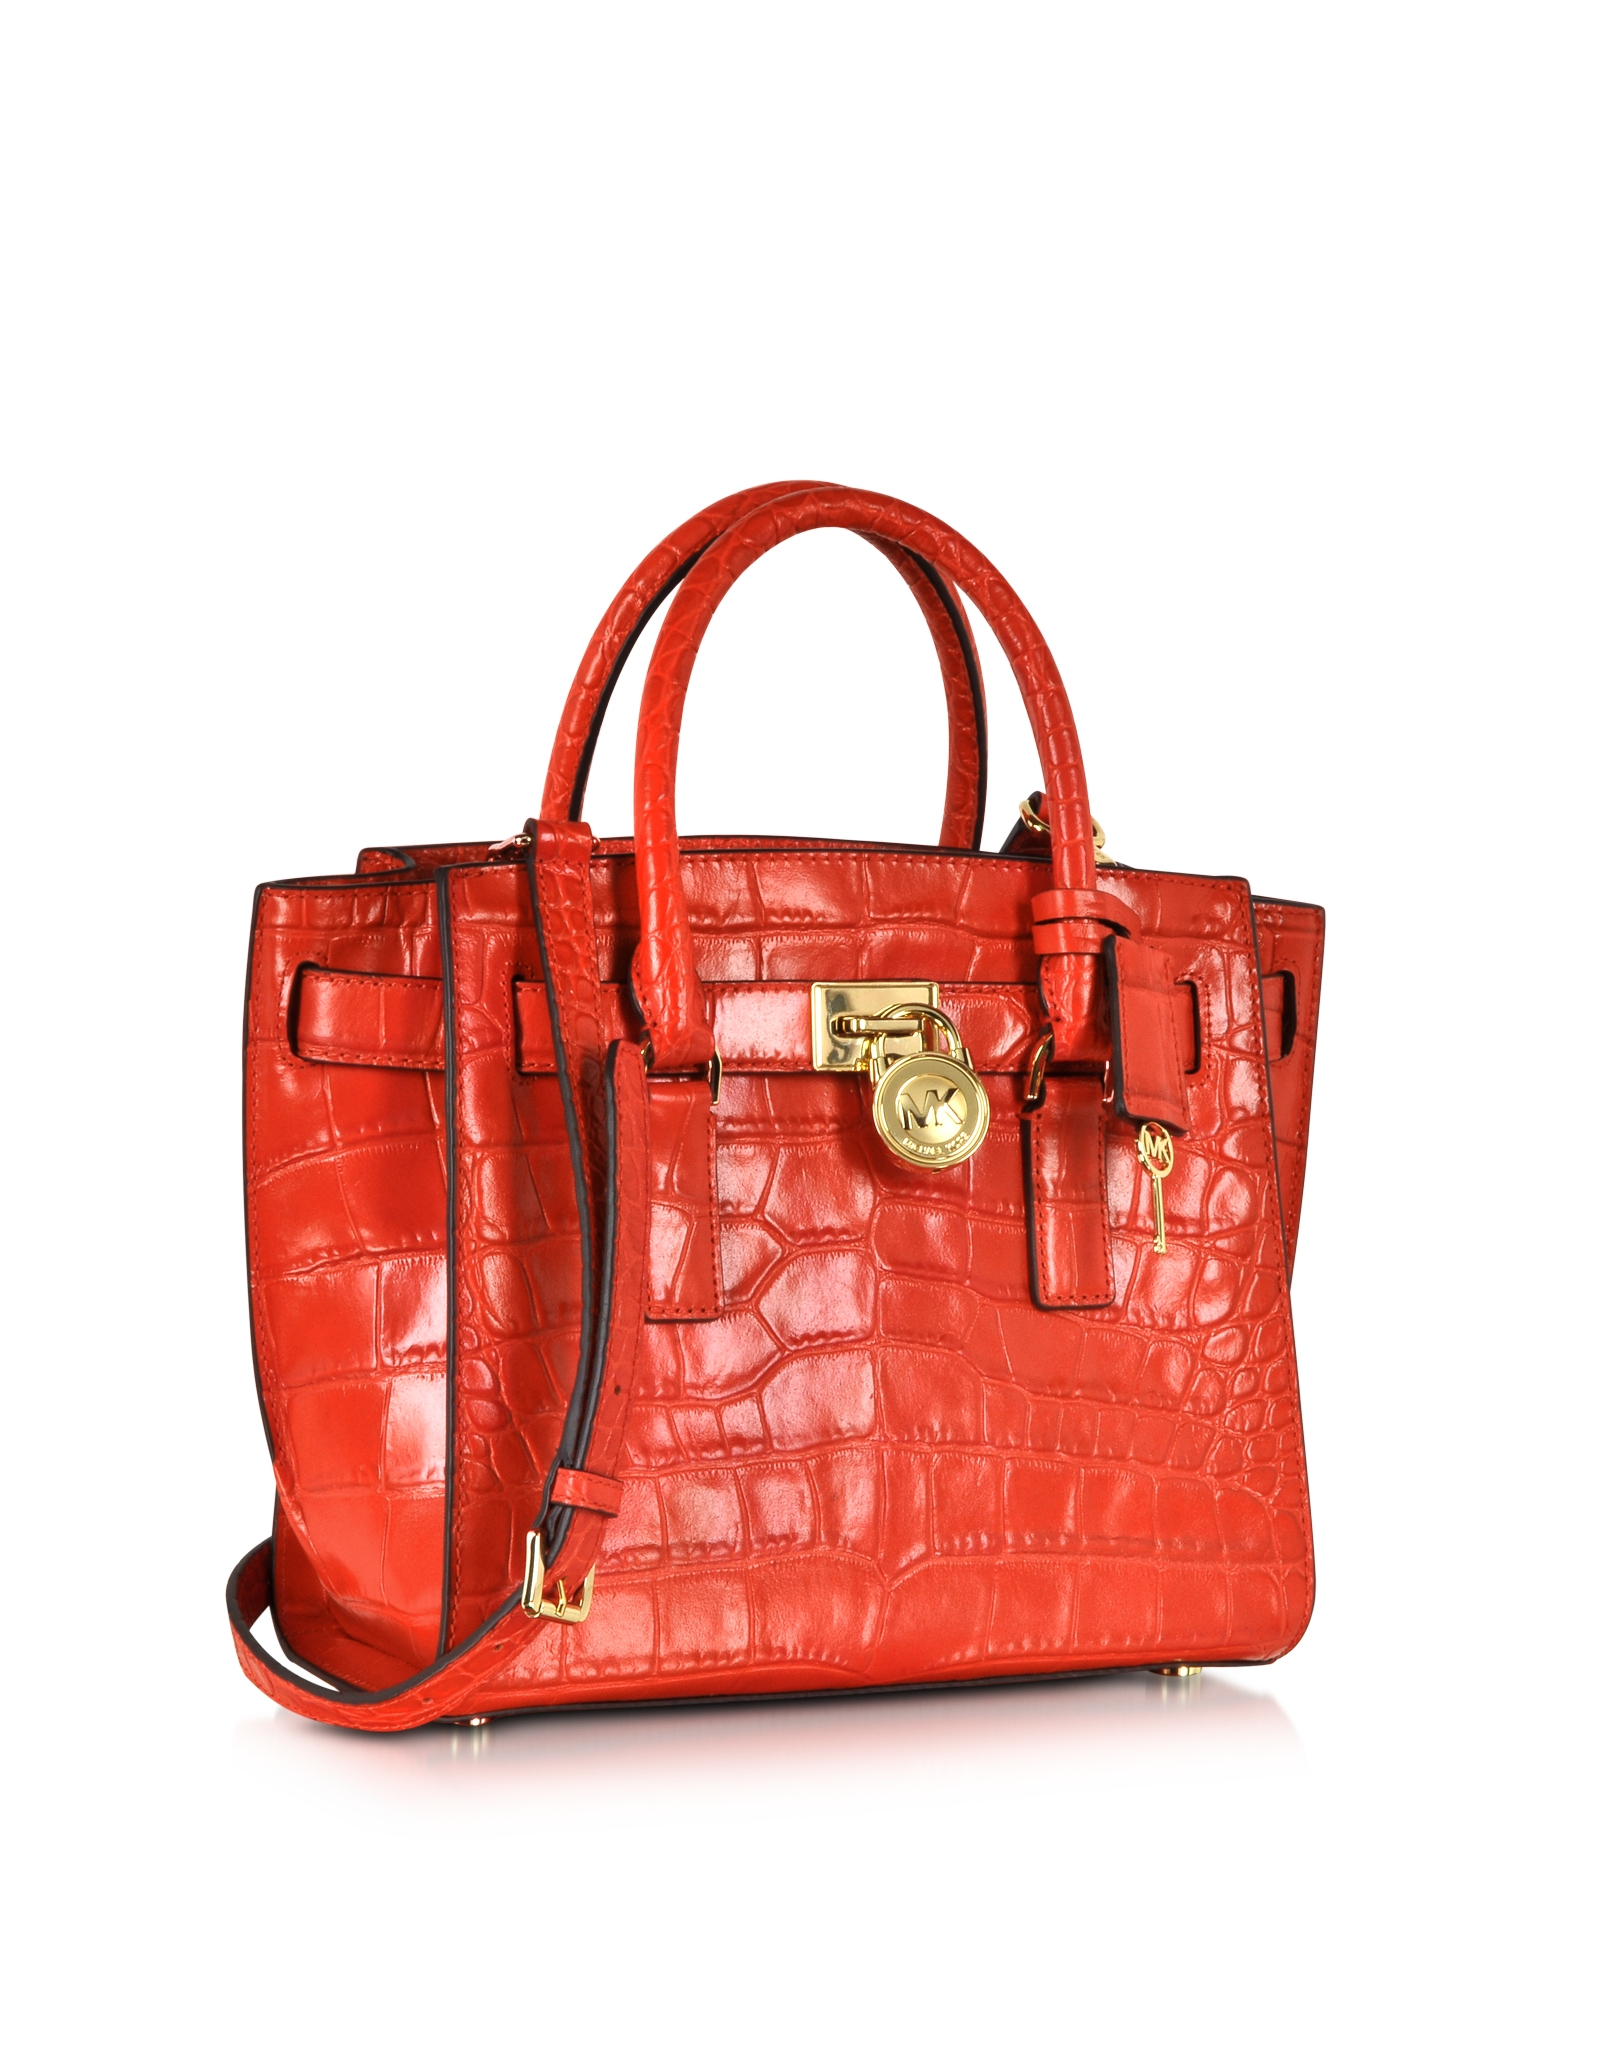 b603d7524f4f Gallery. Women's Hermes Picotin Women's Gym Bags Women's Michael Kors ...